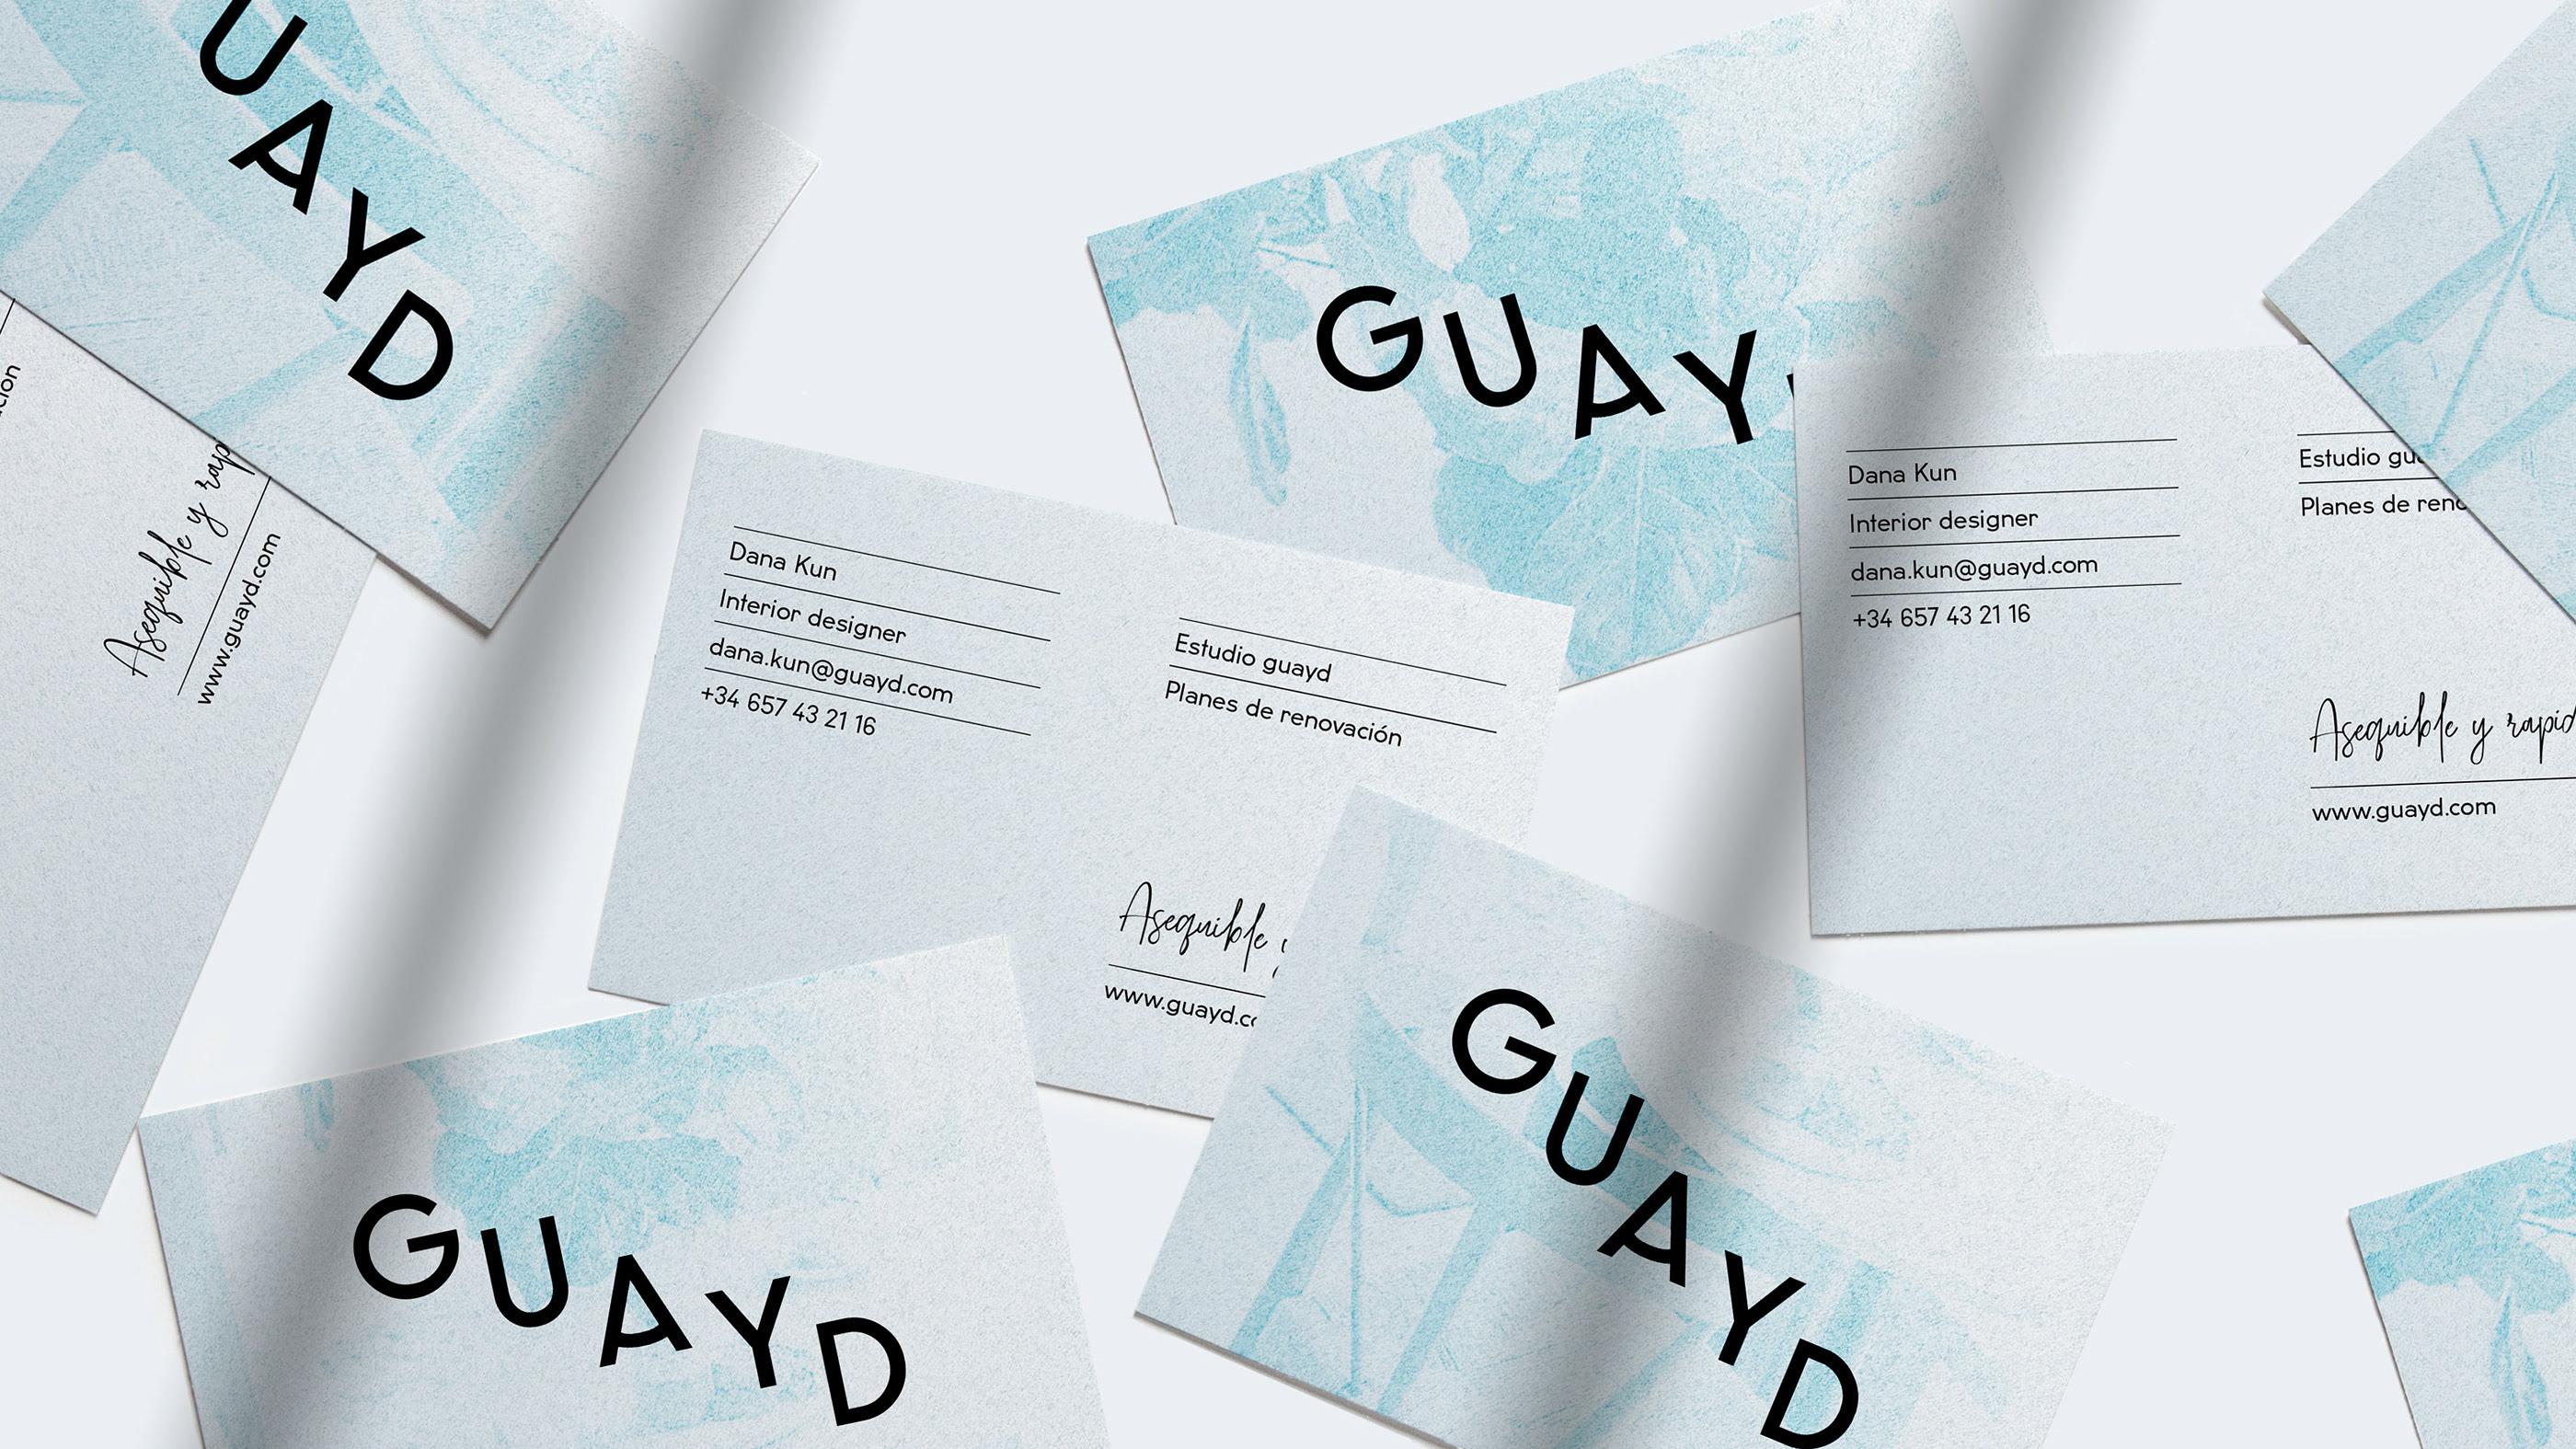 GUAYD brand